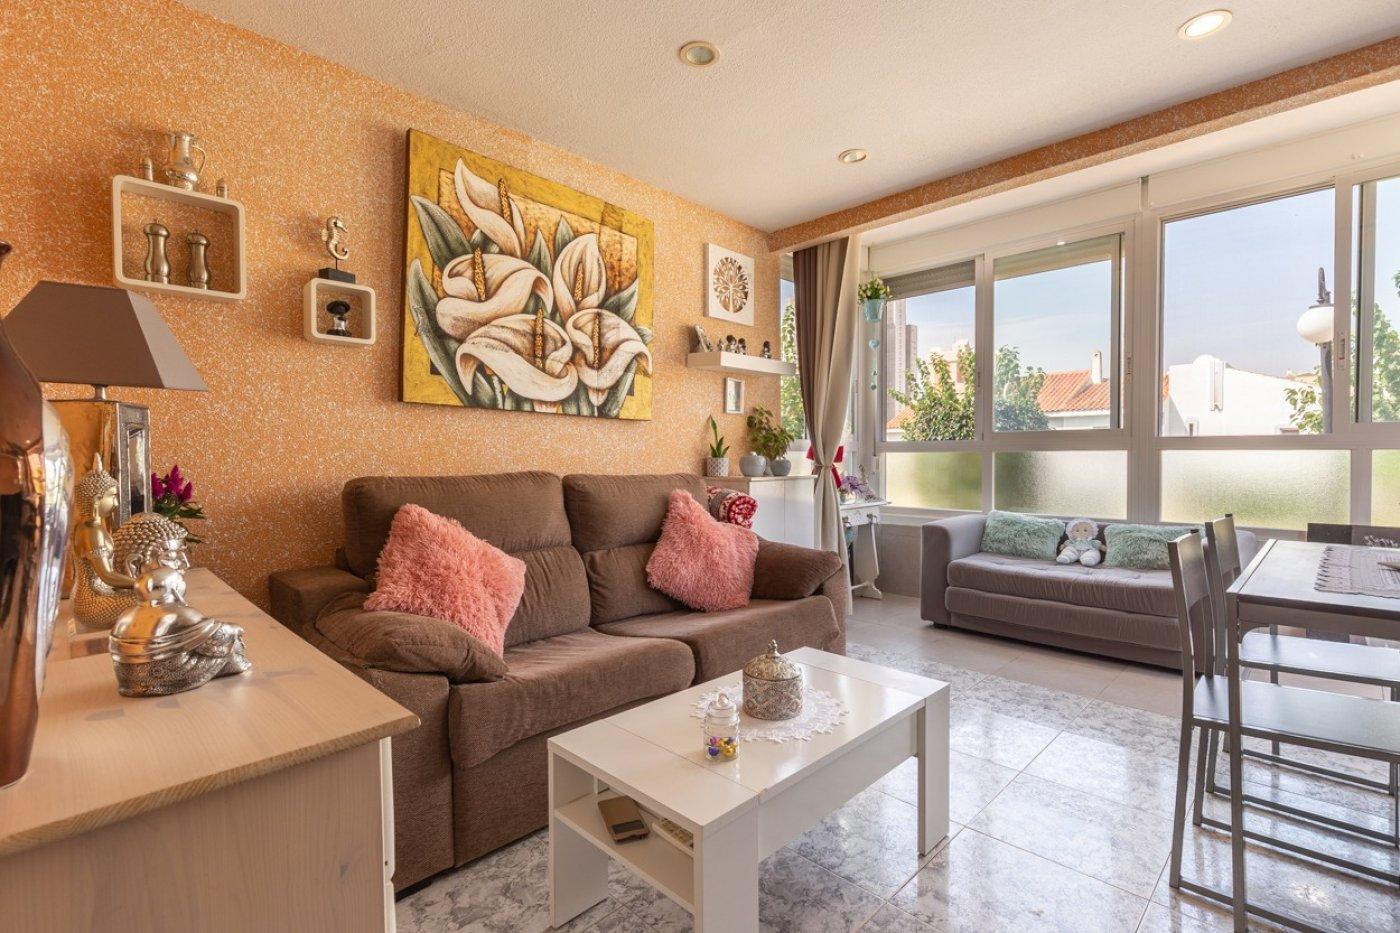 Apartamento en Benidorm zona Rincon de Loix de 40 m²